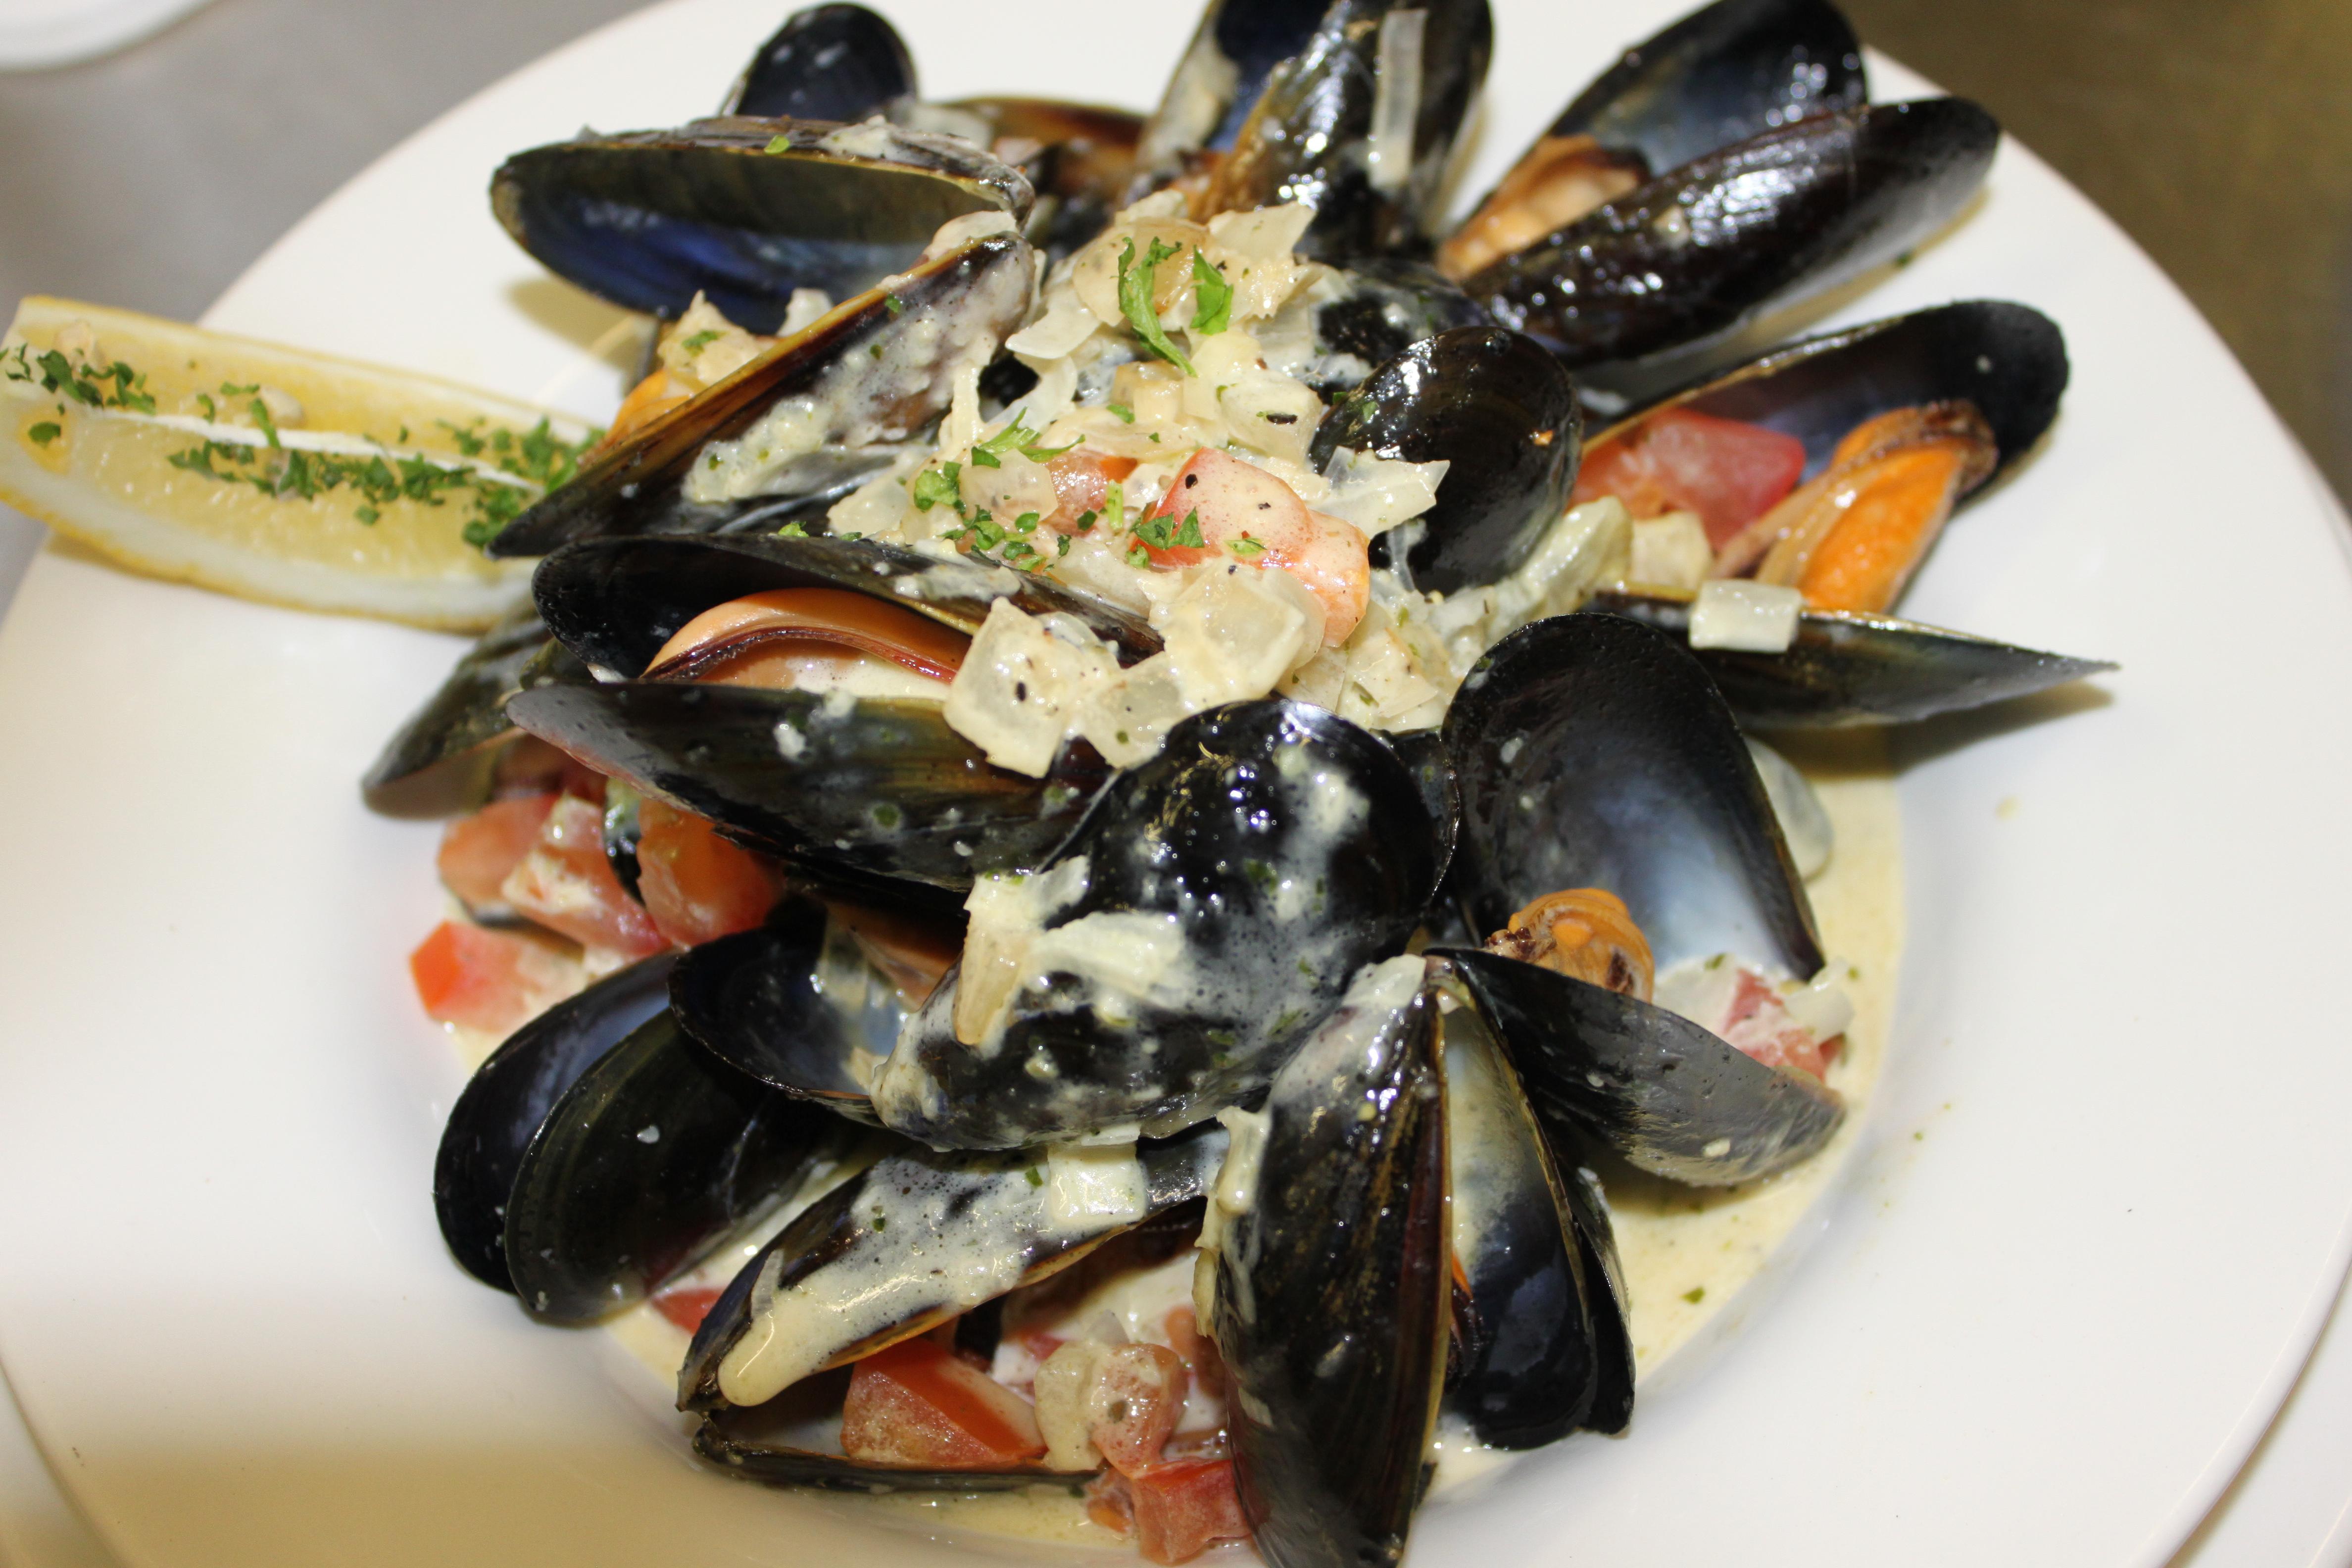 Mussels in Pesto White Wine Sauce